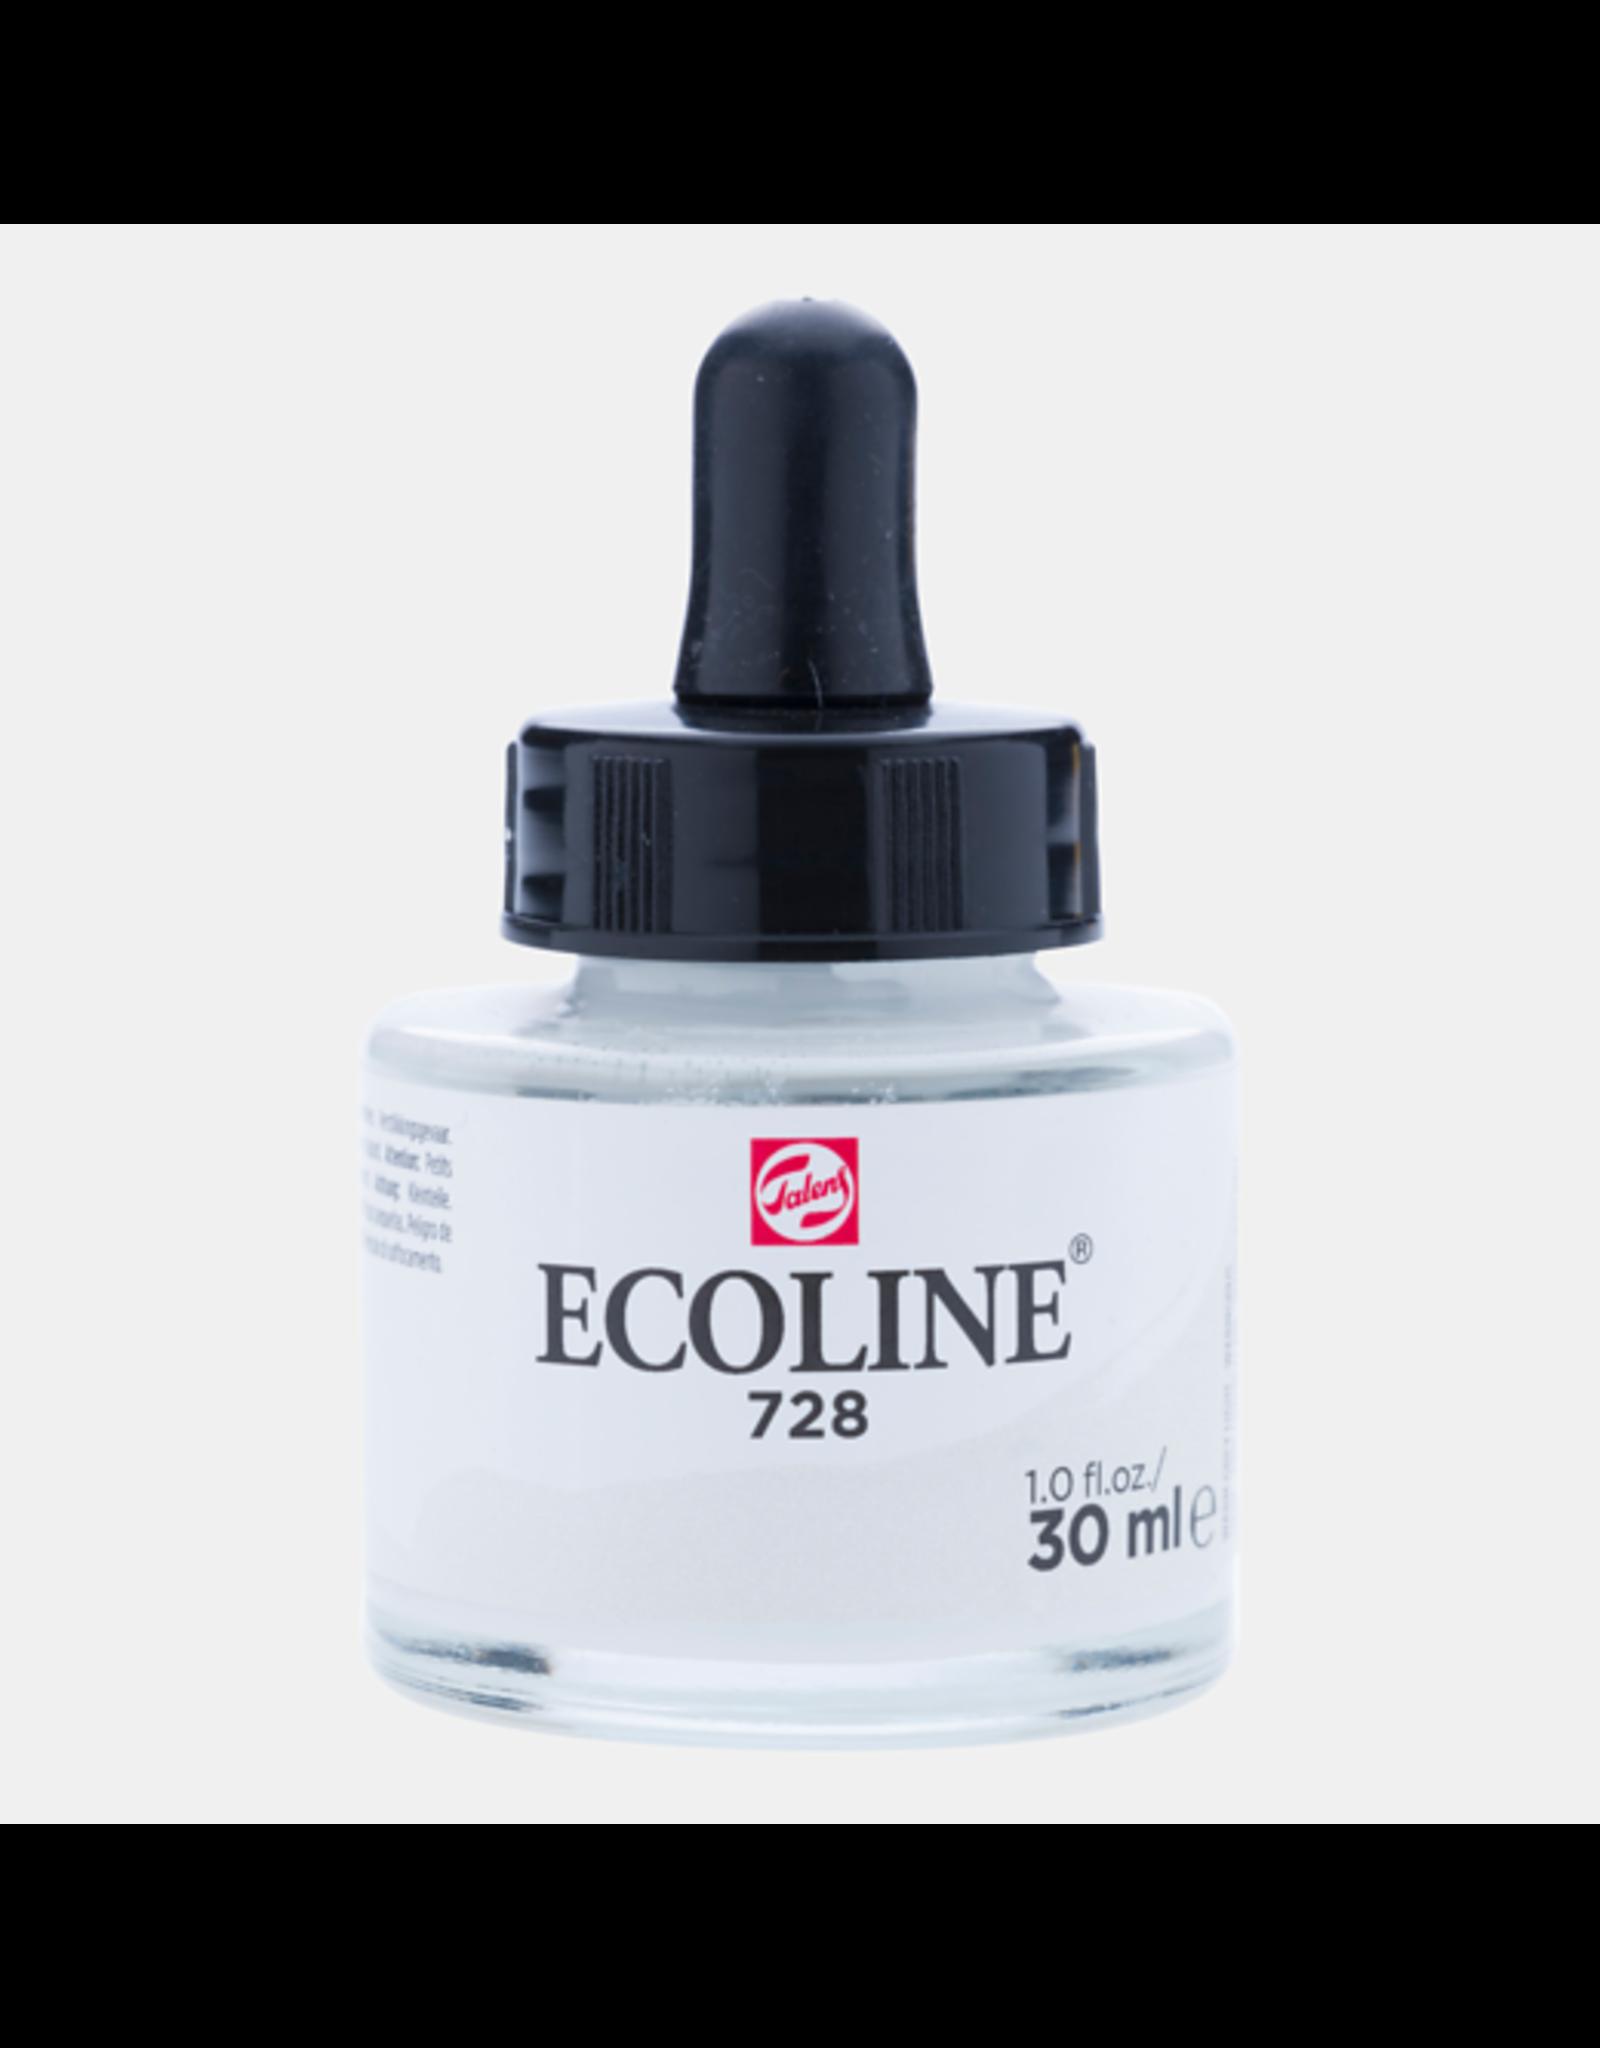 Talens Ecoline 30 ML. Warm grey light